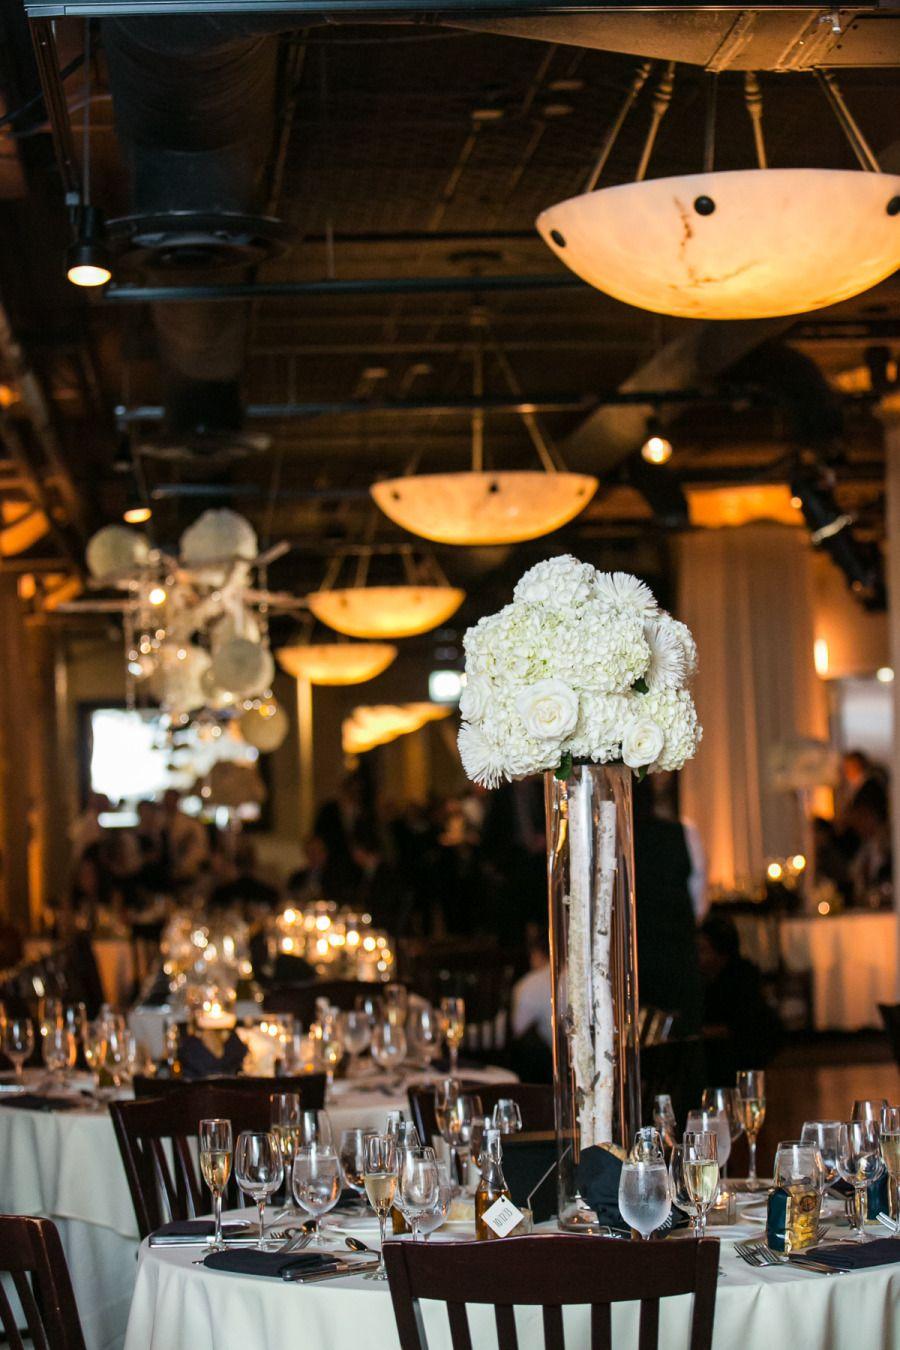 Delightful Romantic Wedding Decor Ideas Image Collections Wedding 25 White Wedding  Decoration Ideas For Romantic Wedding White